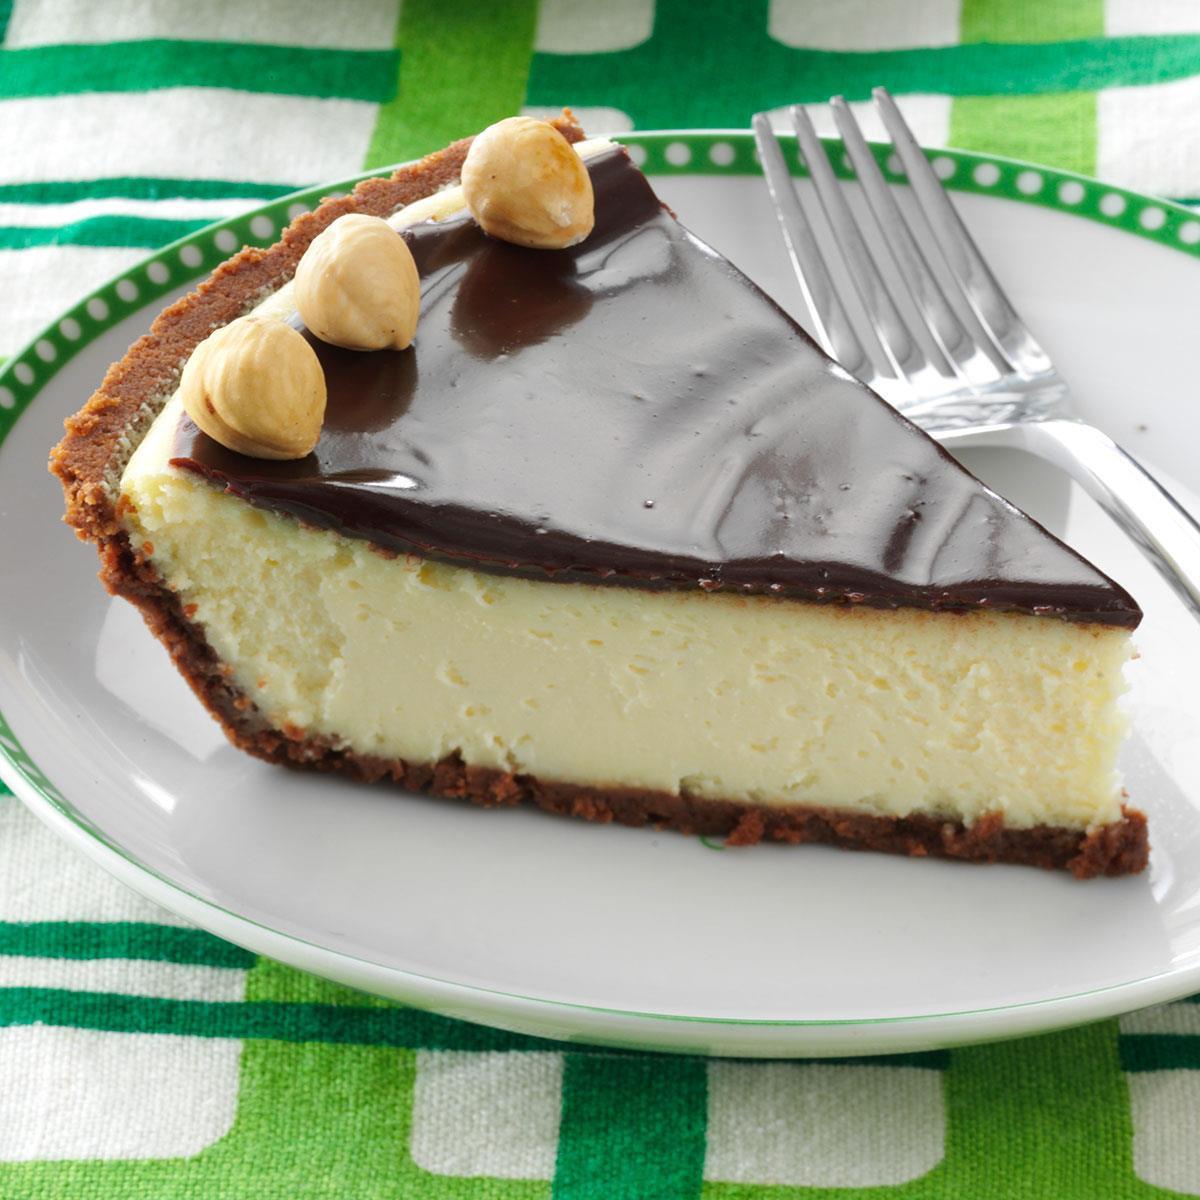 Italian Desserts Recipes  Italian Chocolate Hazelnut Cheesecake Pie Recipe